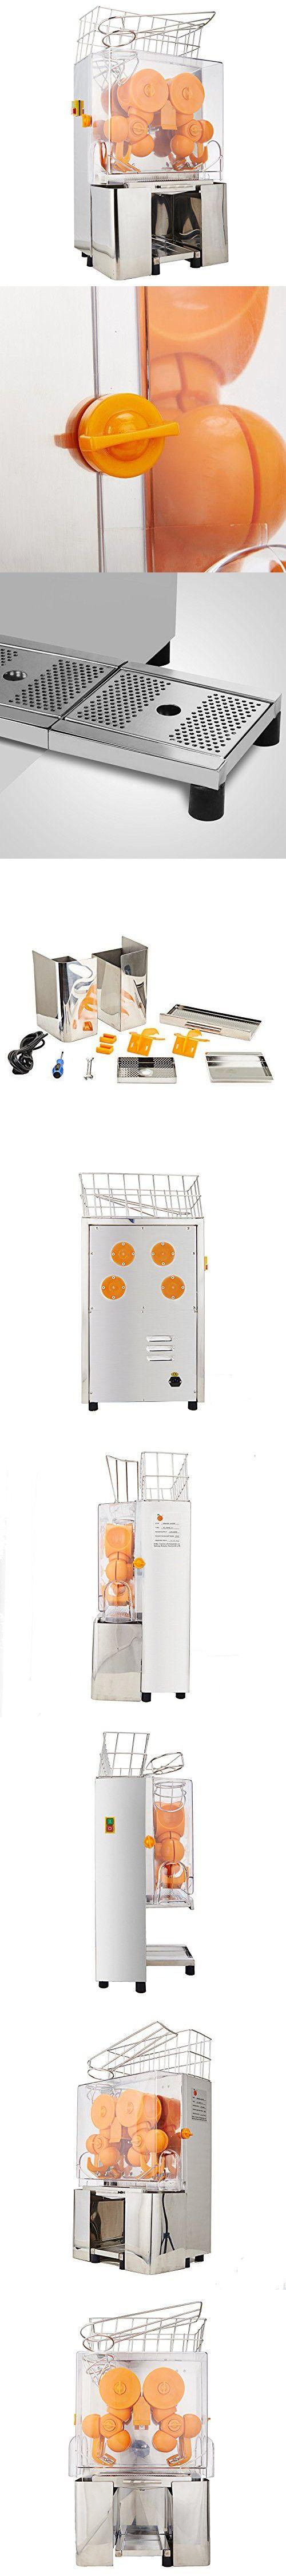 Superland Orange Juice Machine Commercial 120W Orange Juicer Auto Feed 22-30 Oranges per Minute Commercial Juicer Machine Stainless Steel Case (22-30 Oranges per Minute)